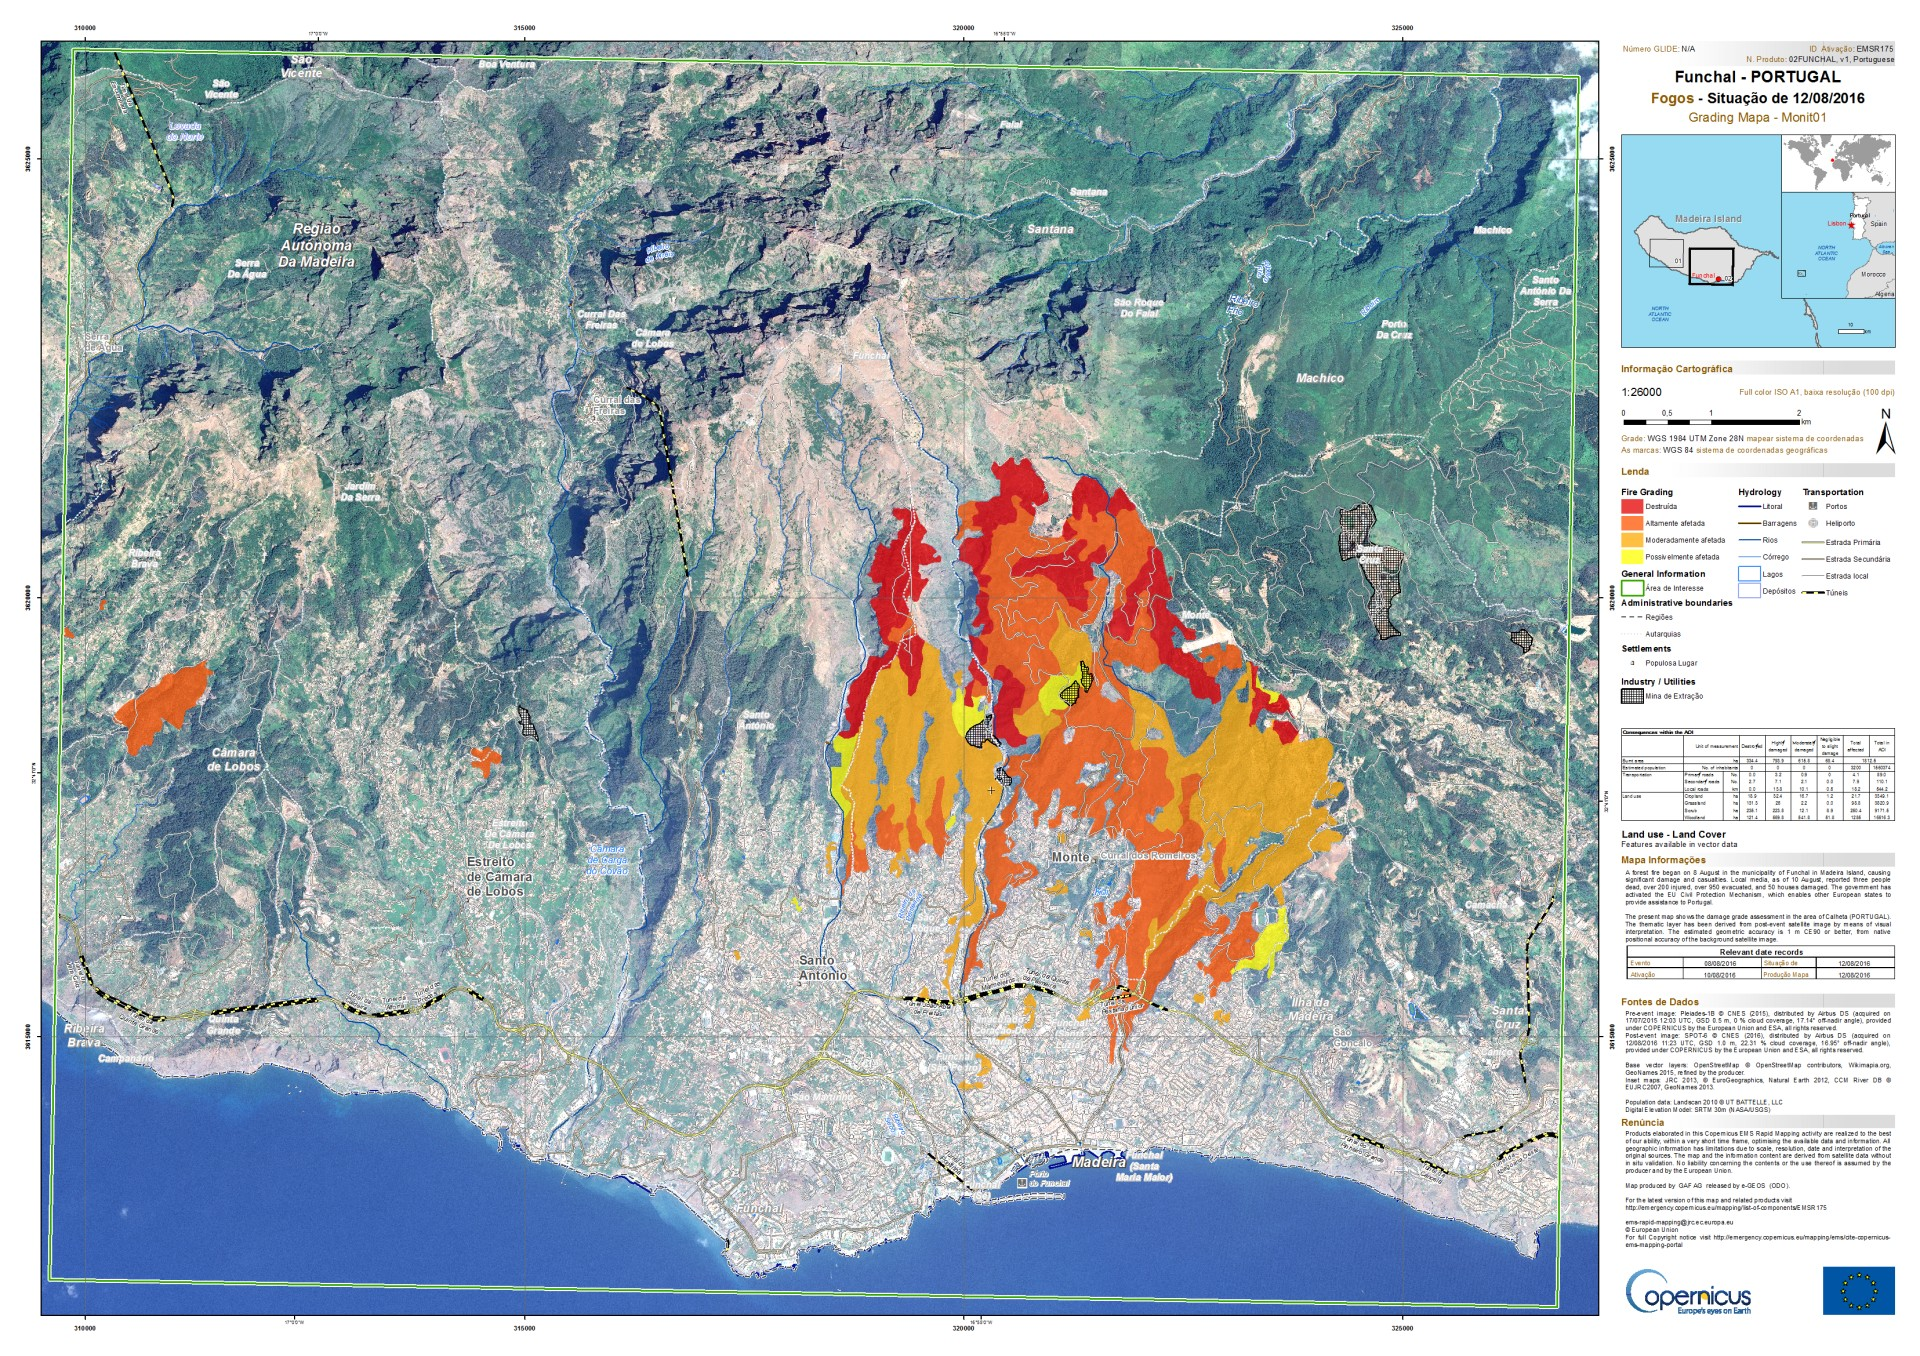 Copernicus - Emergency Mapping Service - EMS - Union Européenne - Grading map - cartographie rapide - Madeira - Madère - Funchal - Pléiades - SPOT 6 - GMES - Wild fires - activation - EU Civil protection